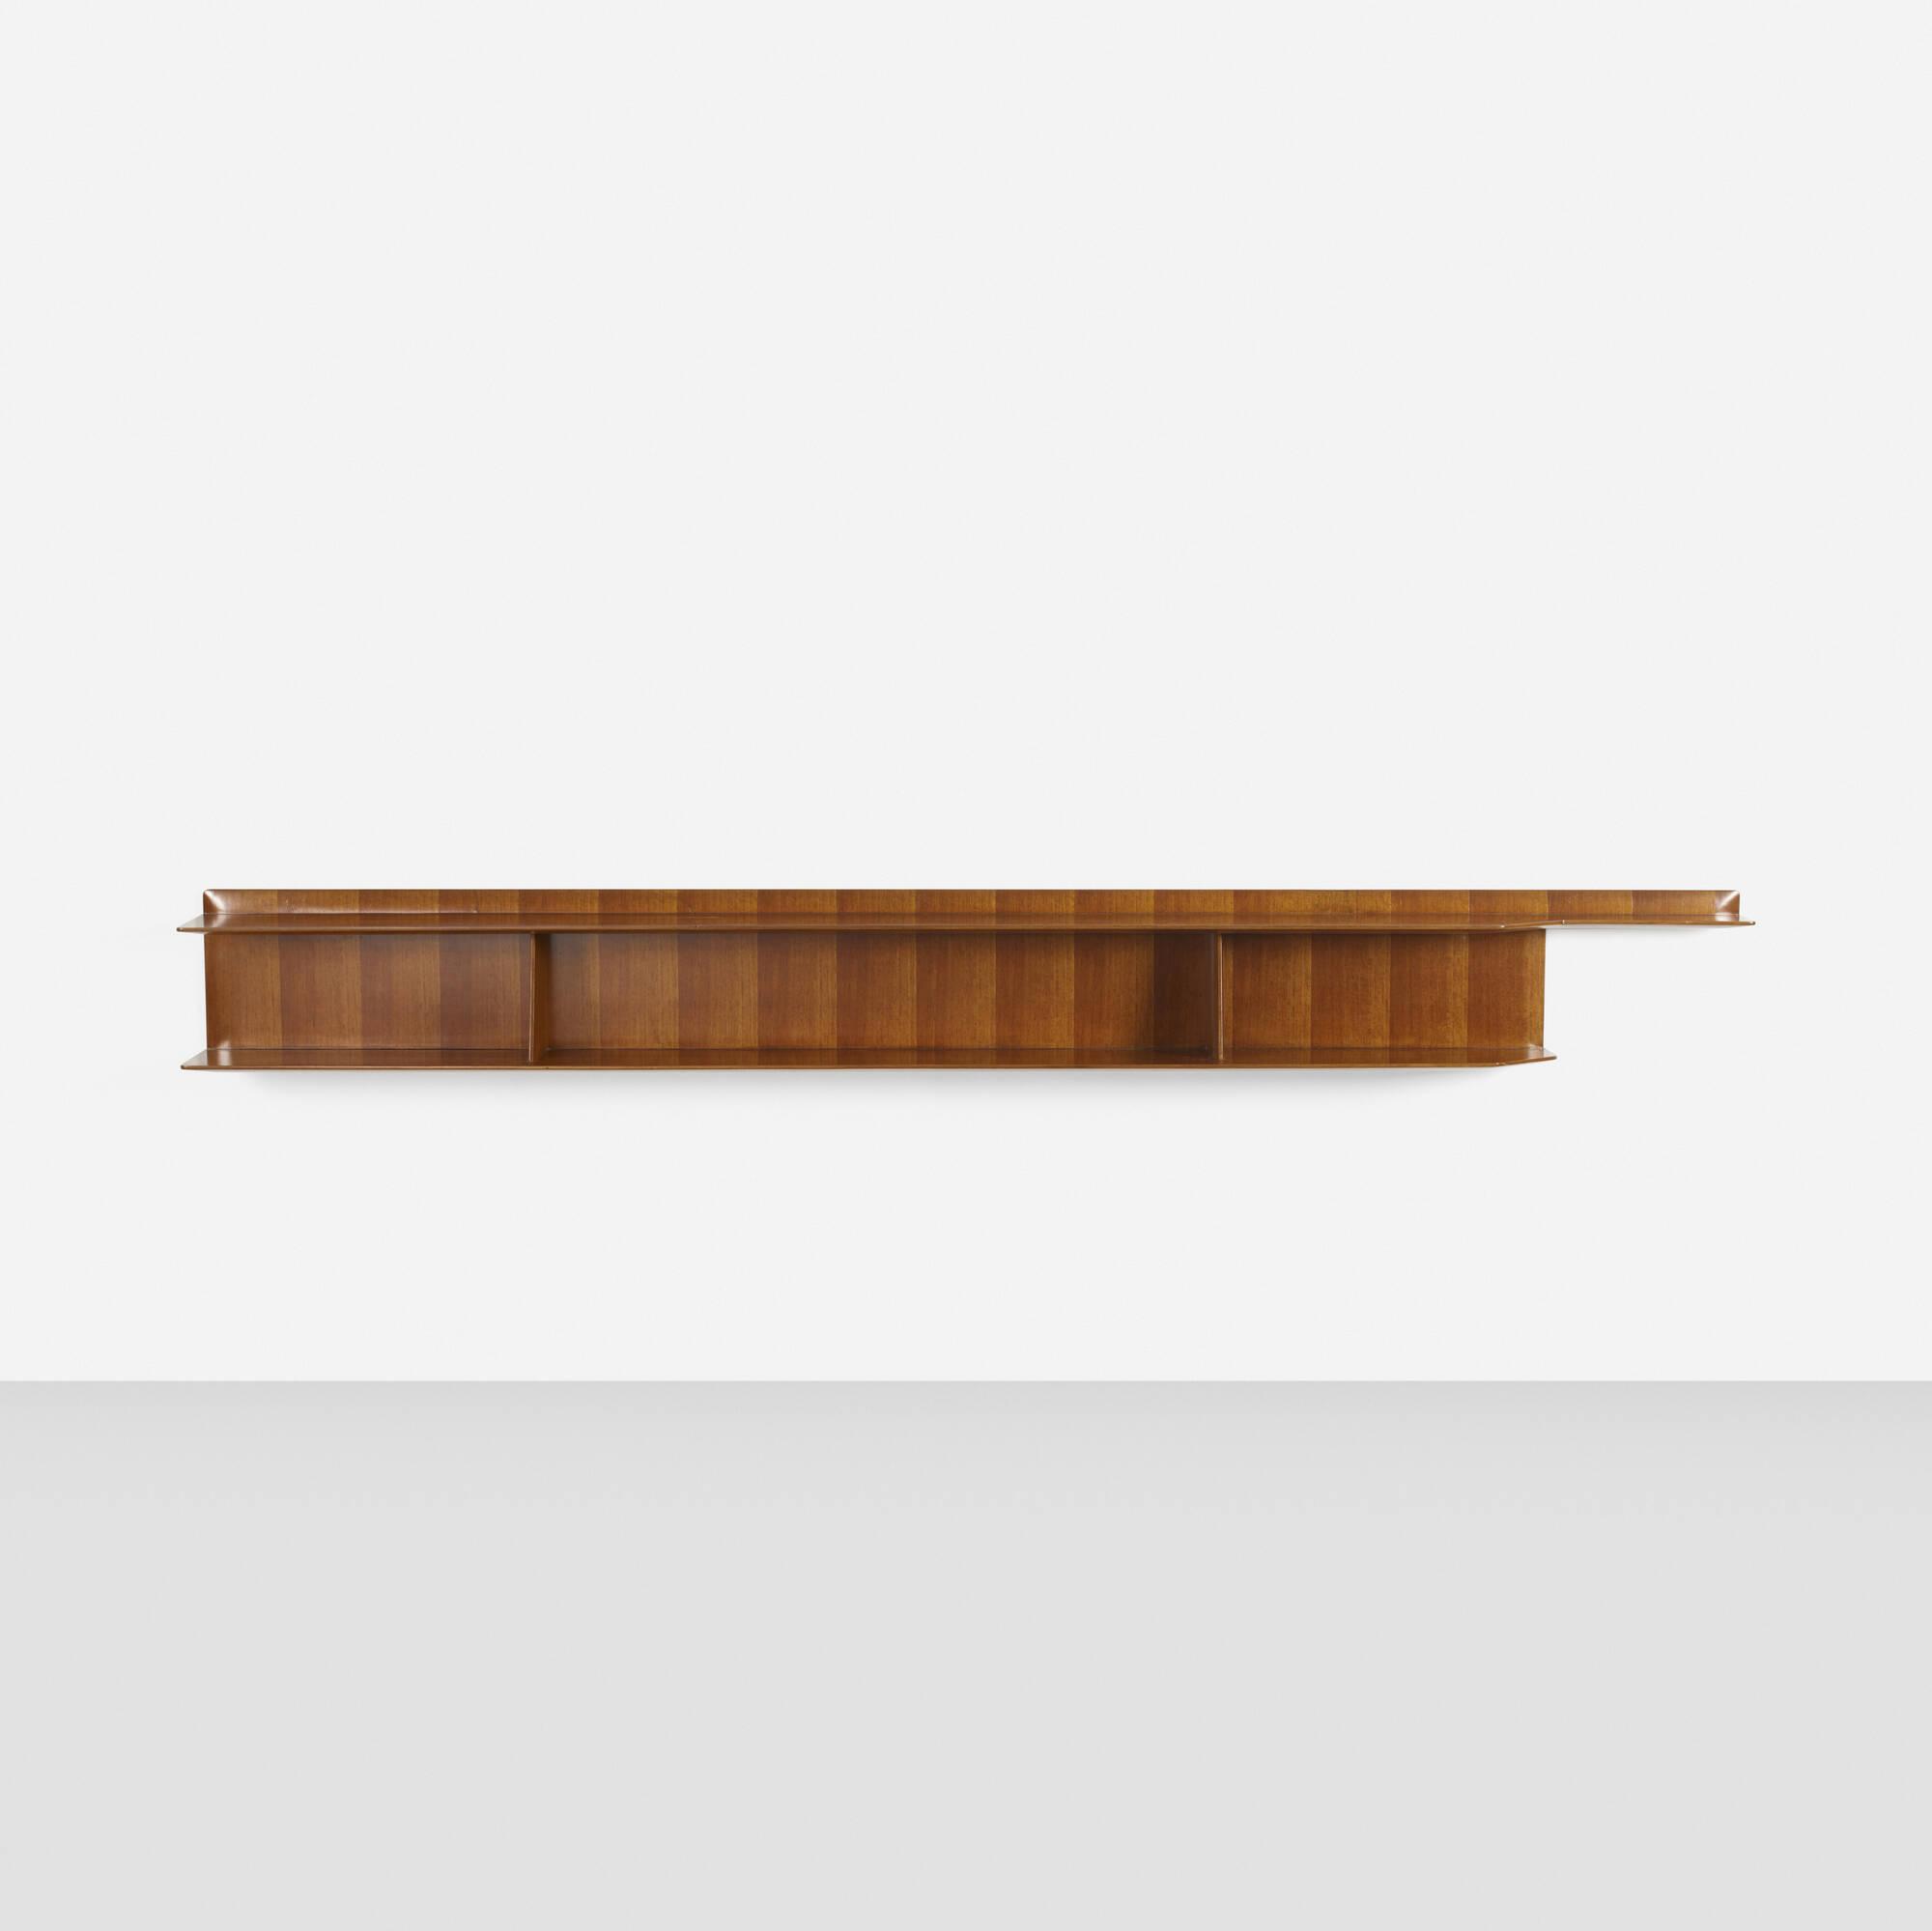 40 Gio Ponti Custom Wall Mounted Shelf For The Federico Residence 2 Of 3